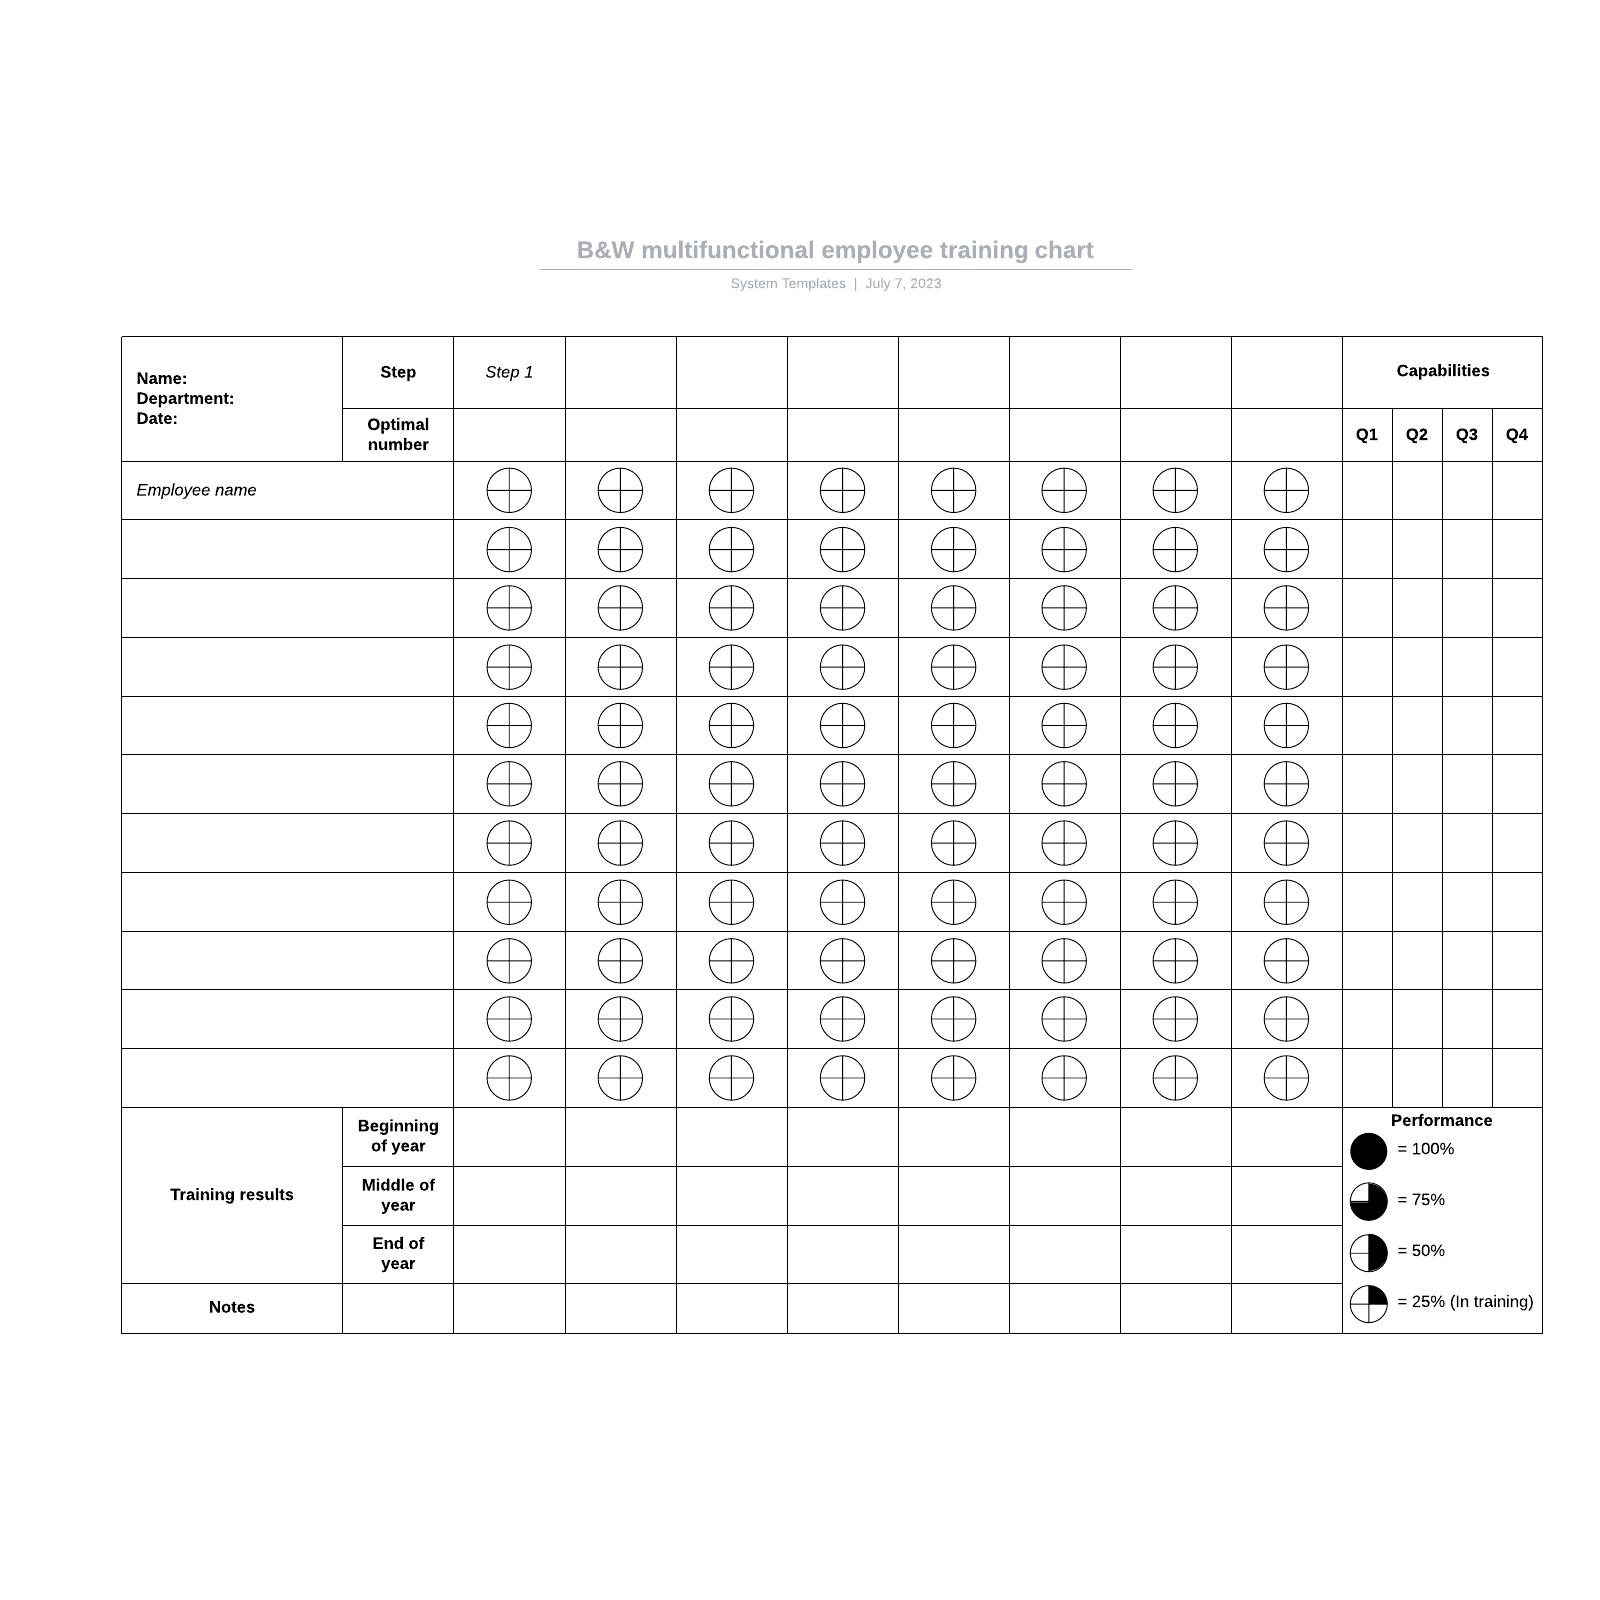 B&W multifunctional employee training chart